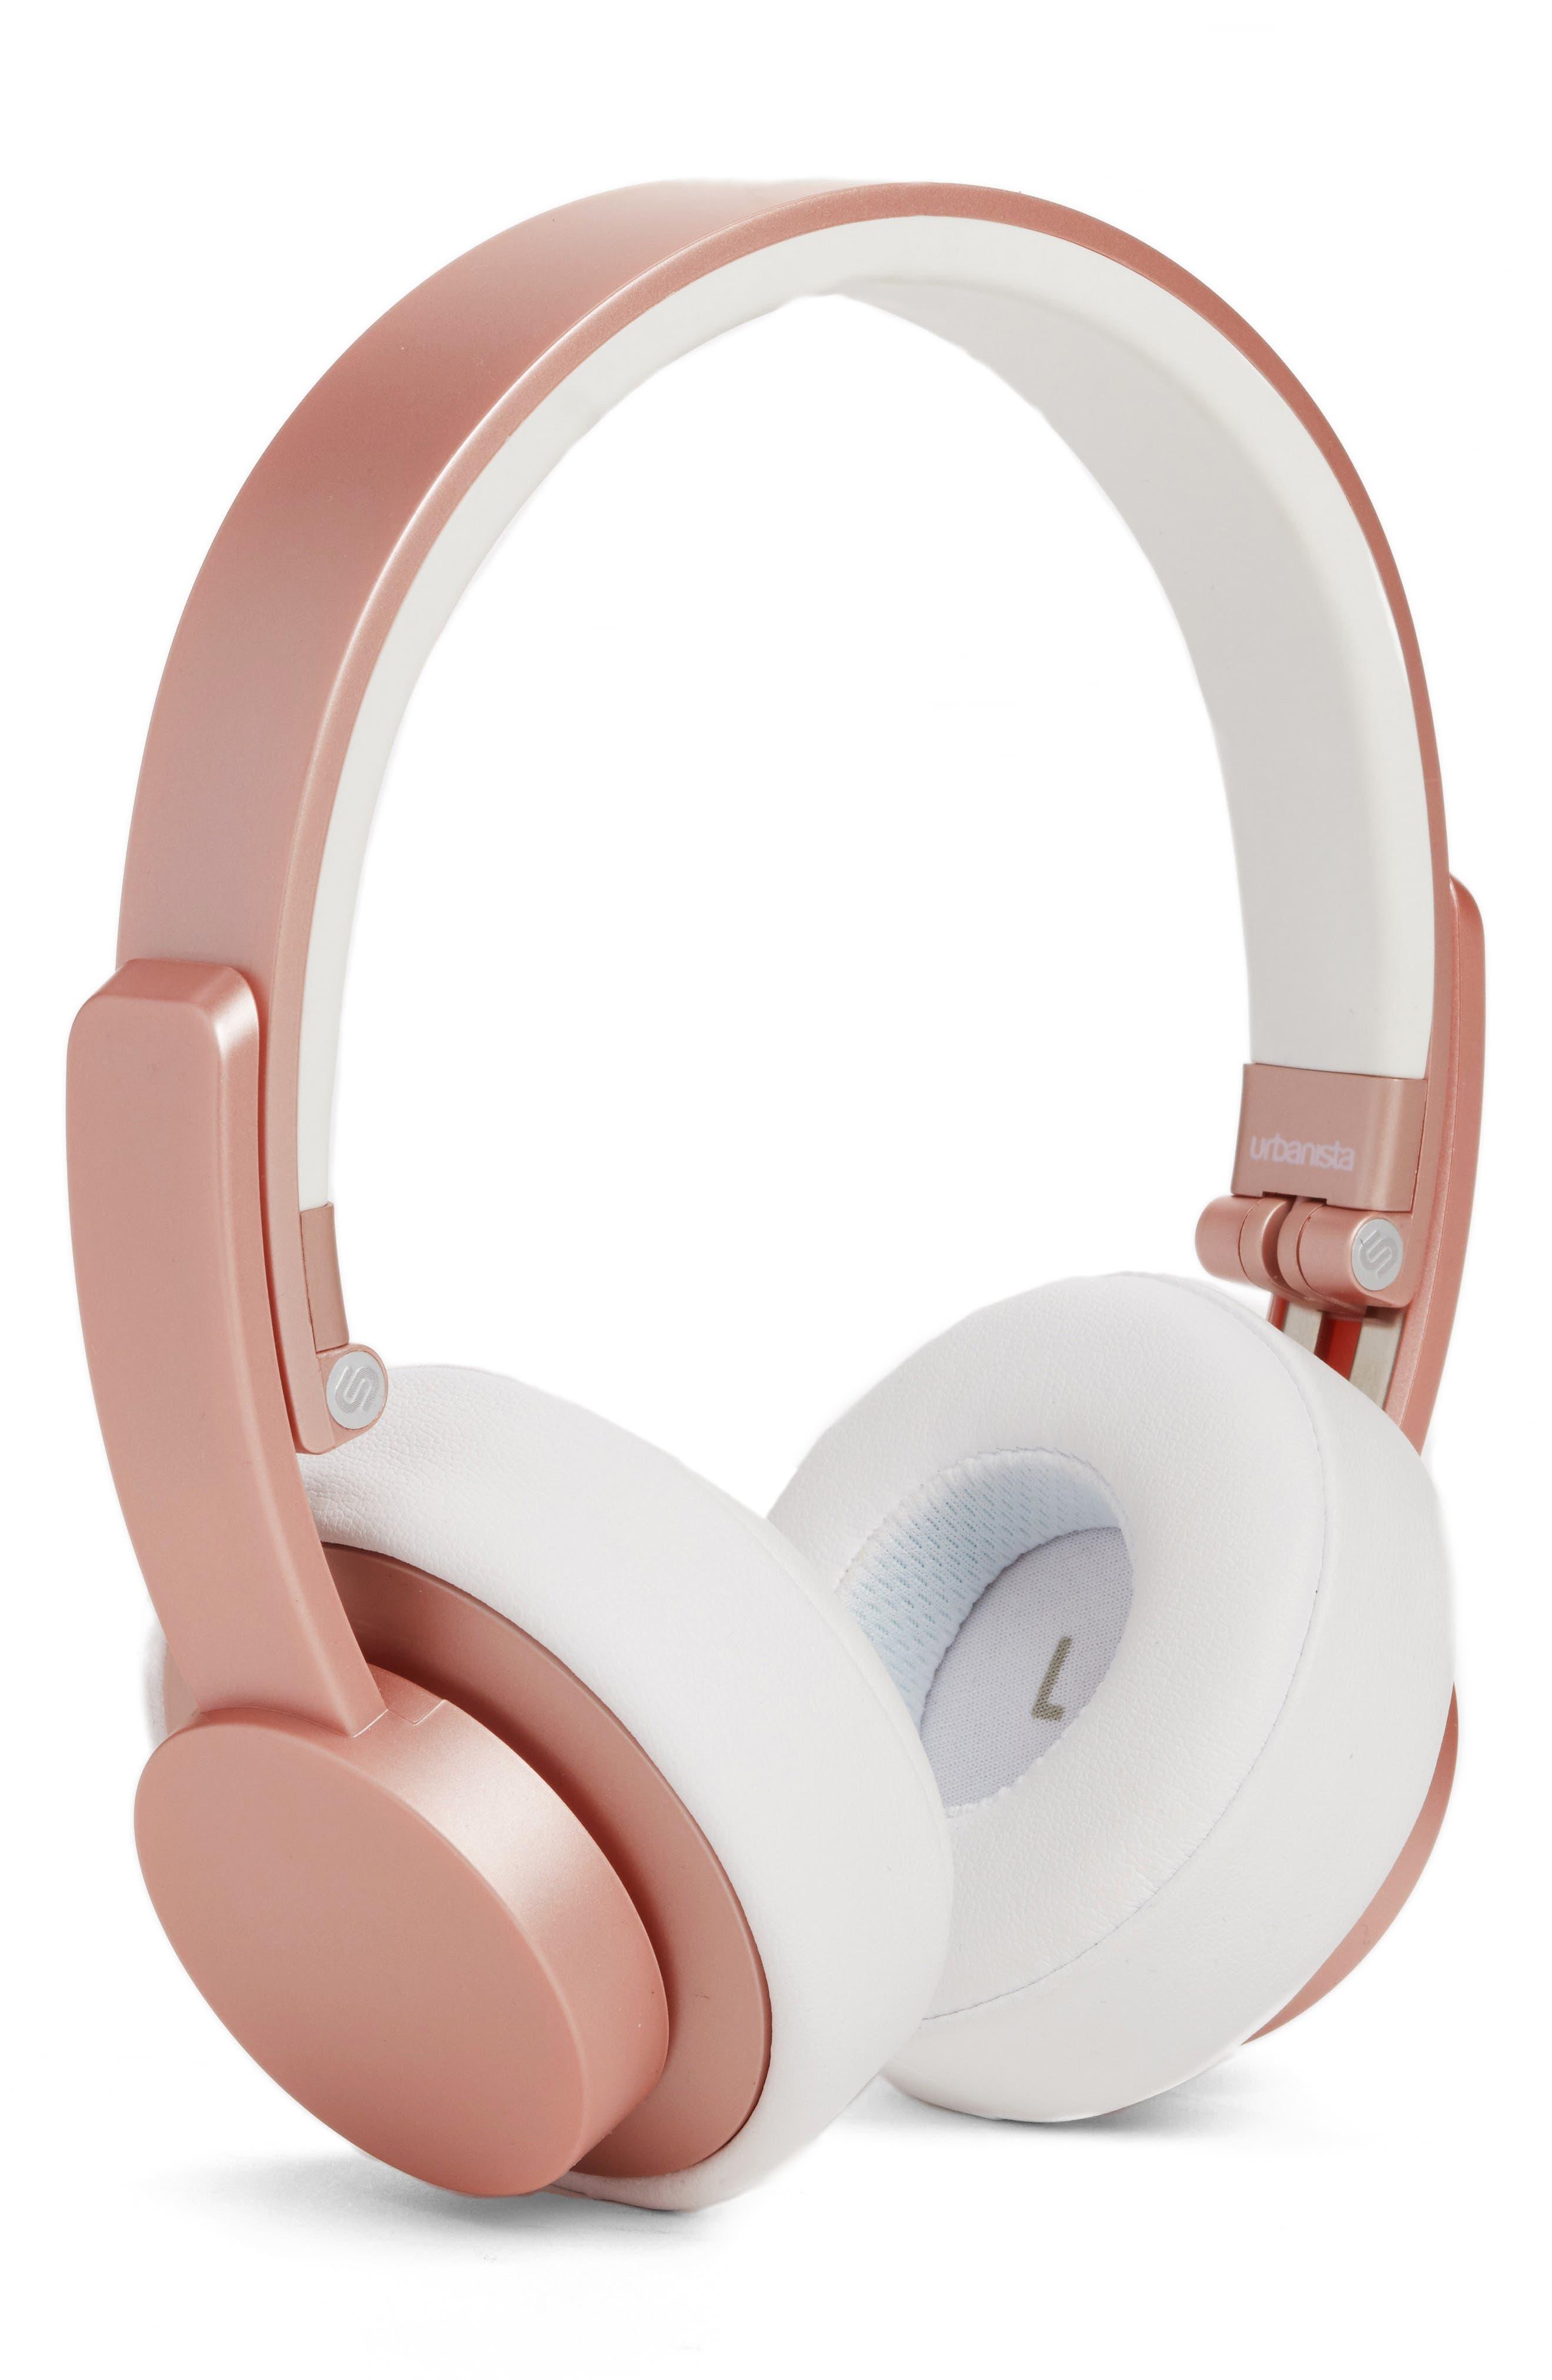 Urbanista Seattle Wireless Headphones